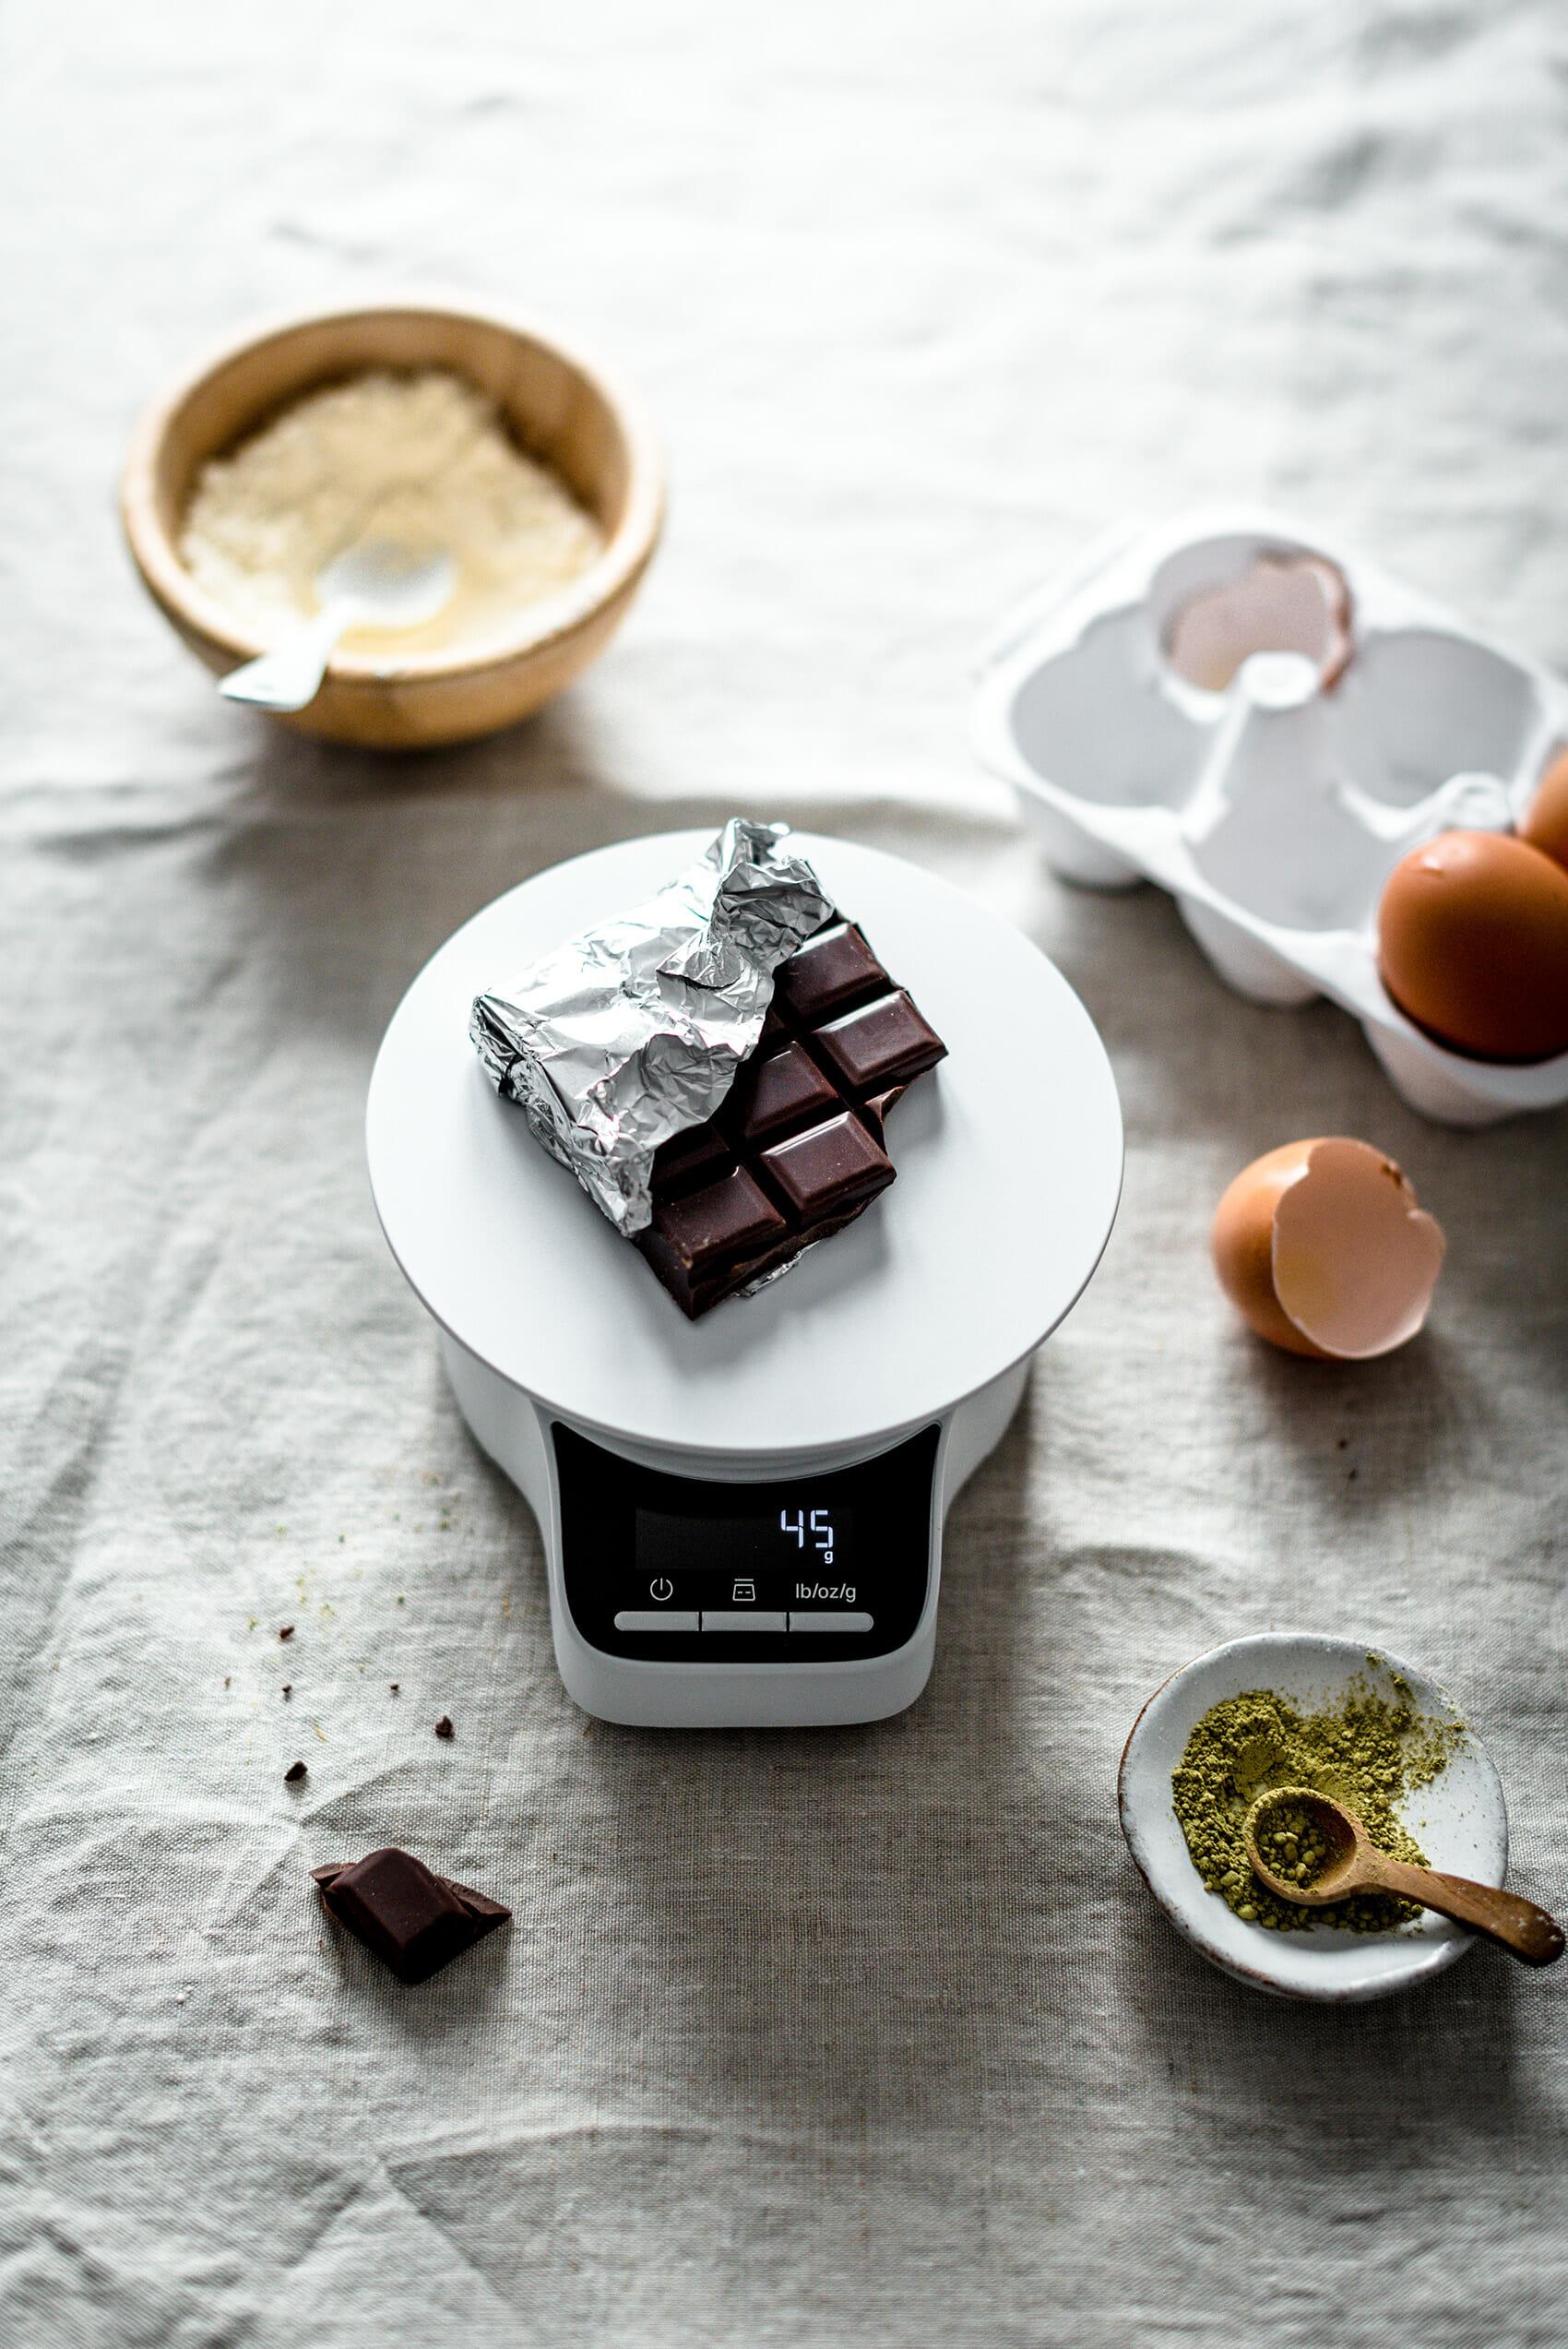 Tamis balance Kitchenaid - Lilie Bakery